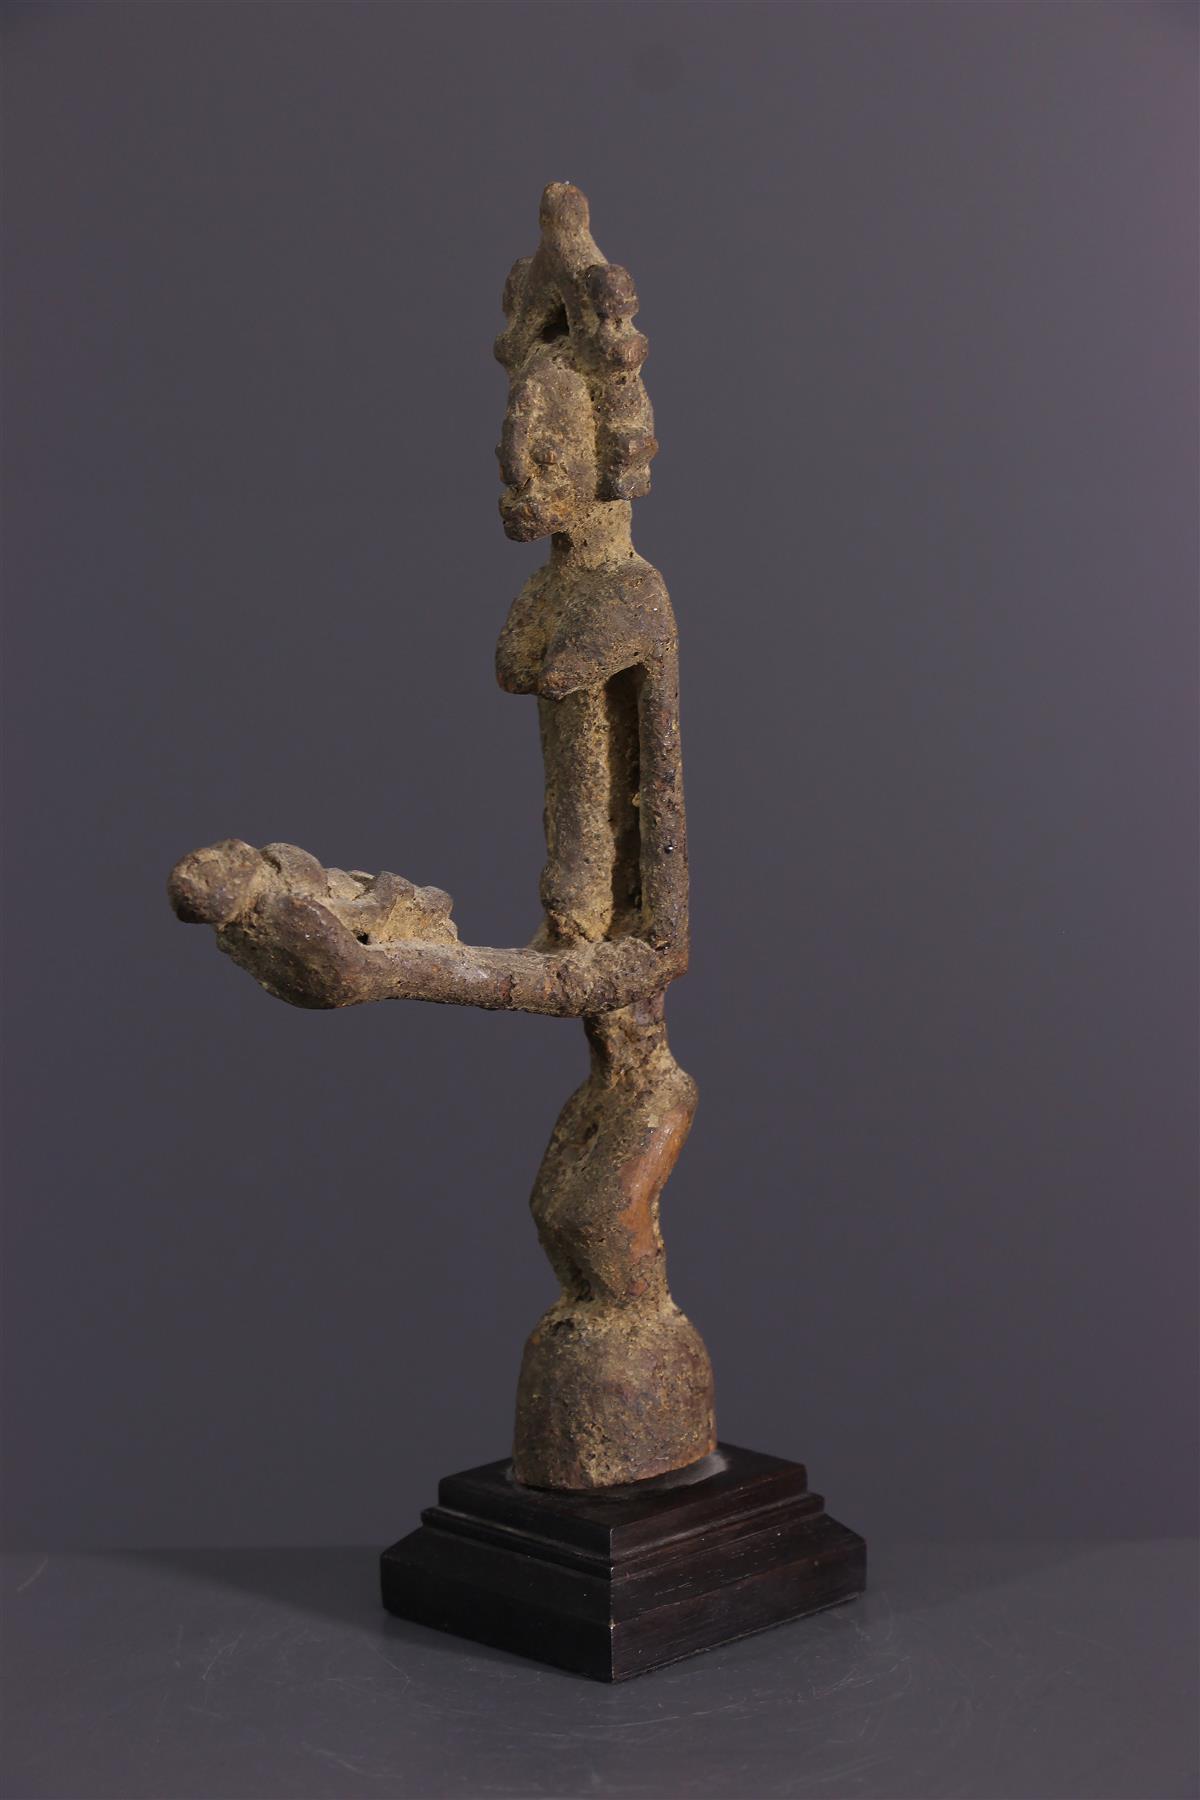 Dogon Statuette - Tribal art